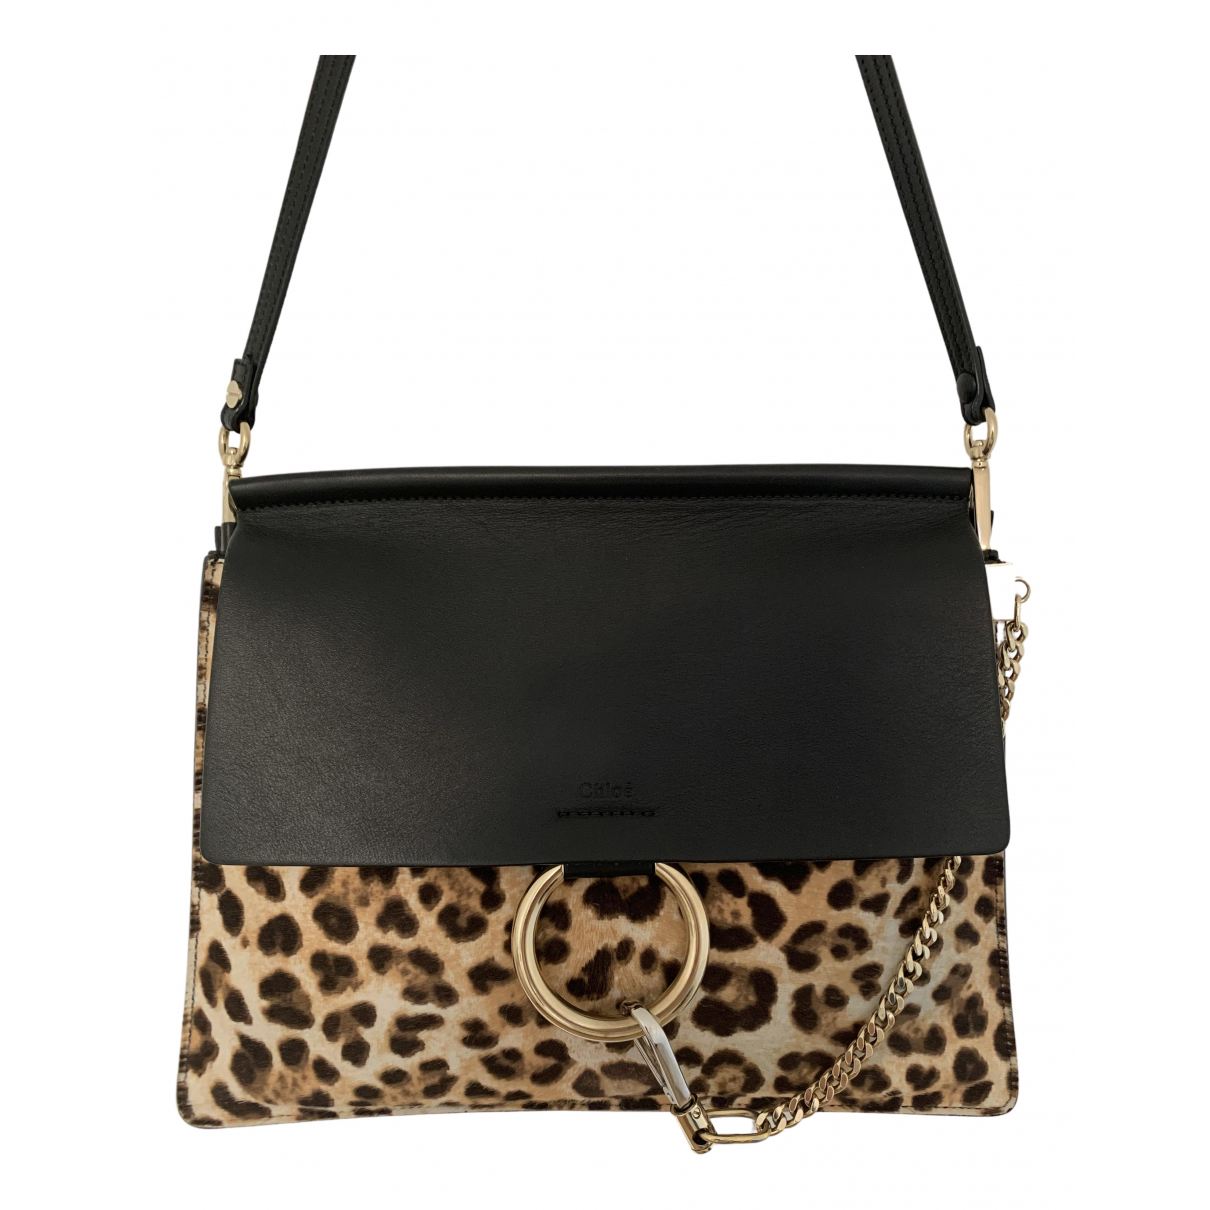 Chloé Faye Black Pony-style calfskin handbag for Women \N